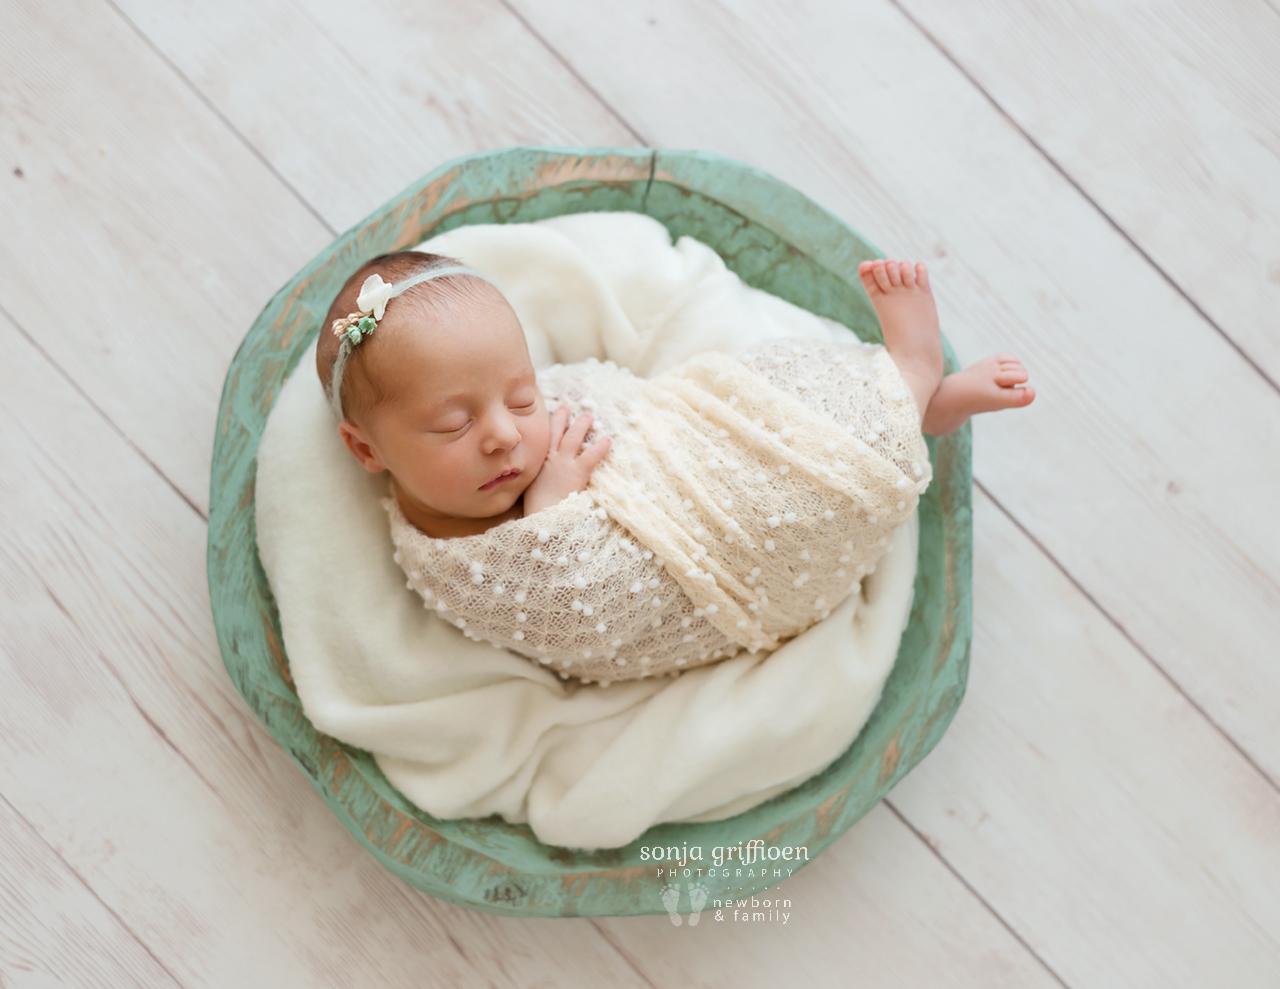 Everlyn-Newborn-Brisbane-Newborn-Photographer-Sonja-Griffioen-10.jpg